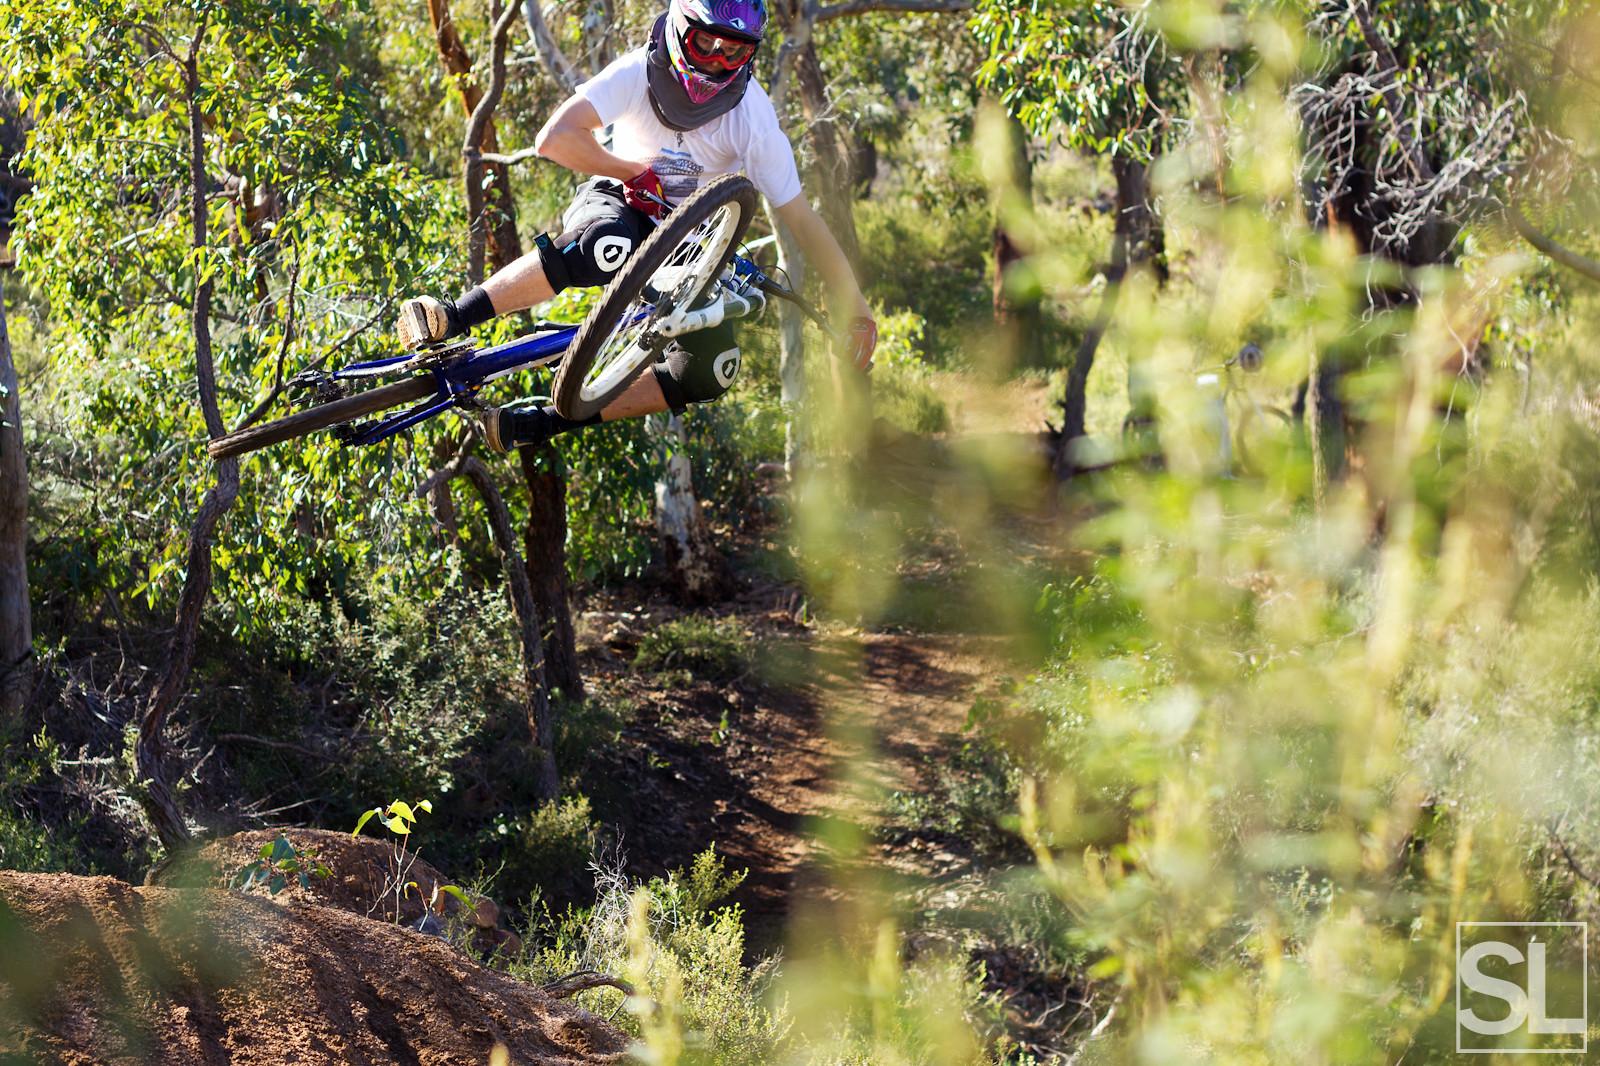 Tabling - Chamakazi - Mountain Biking Pictures - Vital MTB